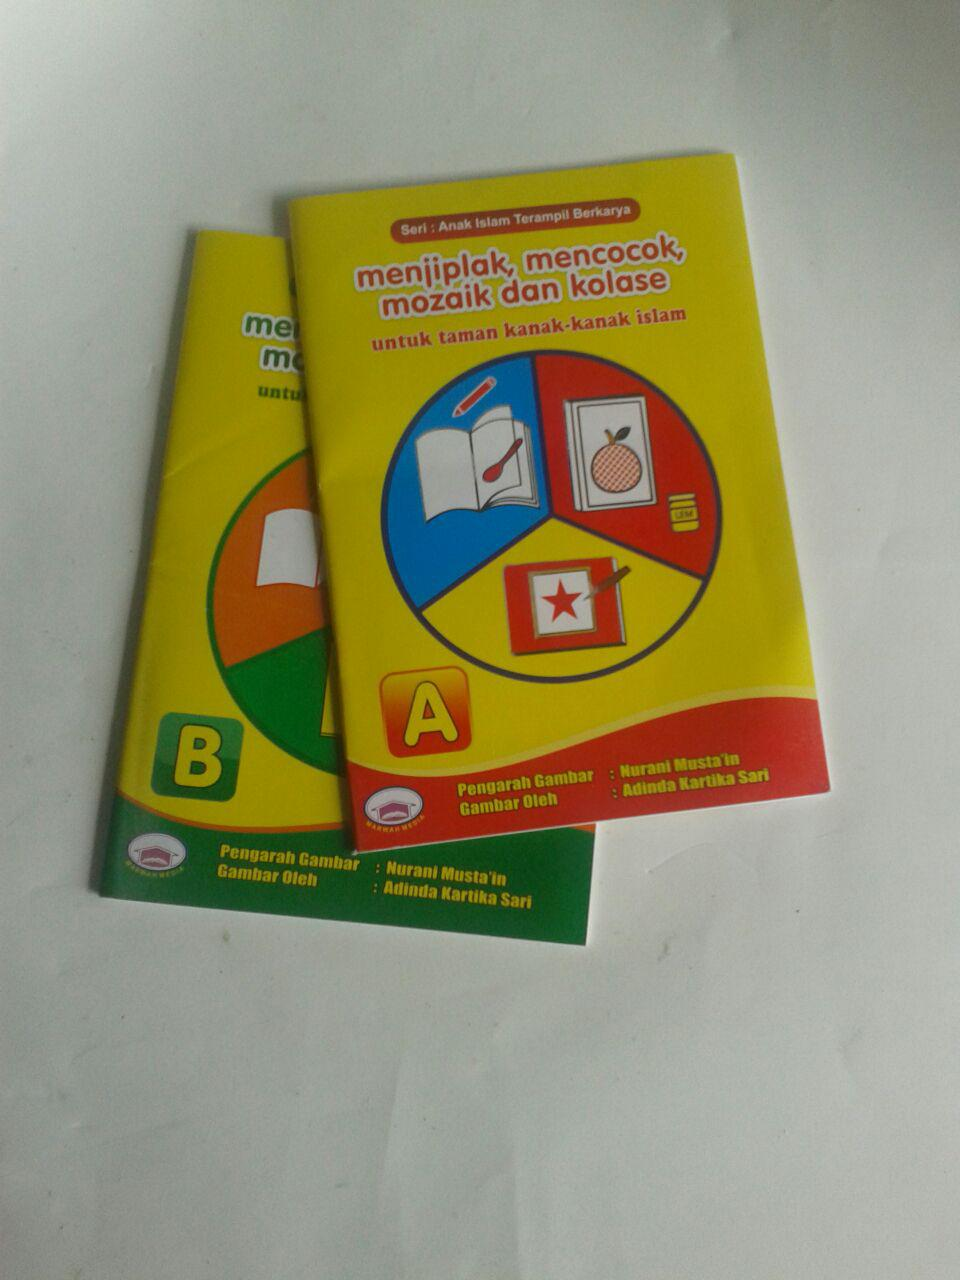 Buku Anak Menjiplak Mencocok Mozaik Dan Kolase Set 2 Jilid cover